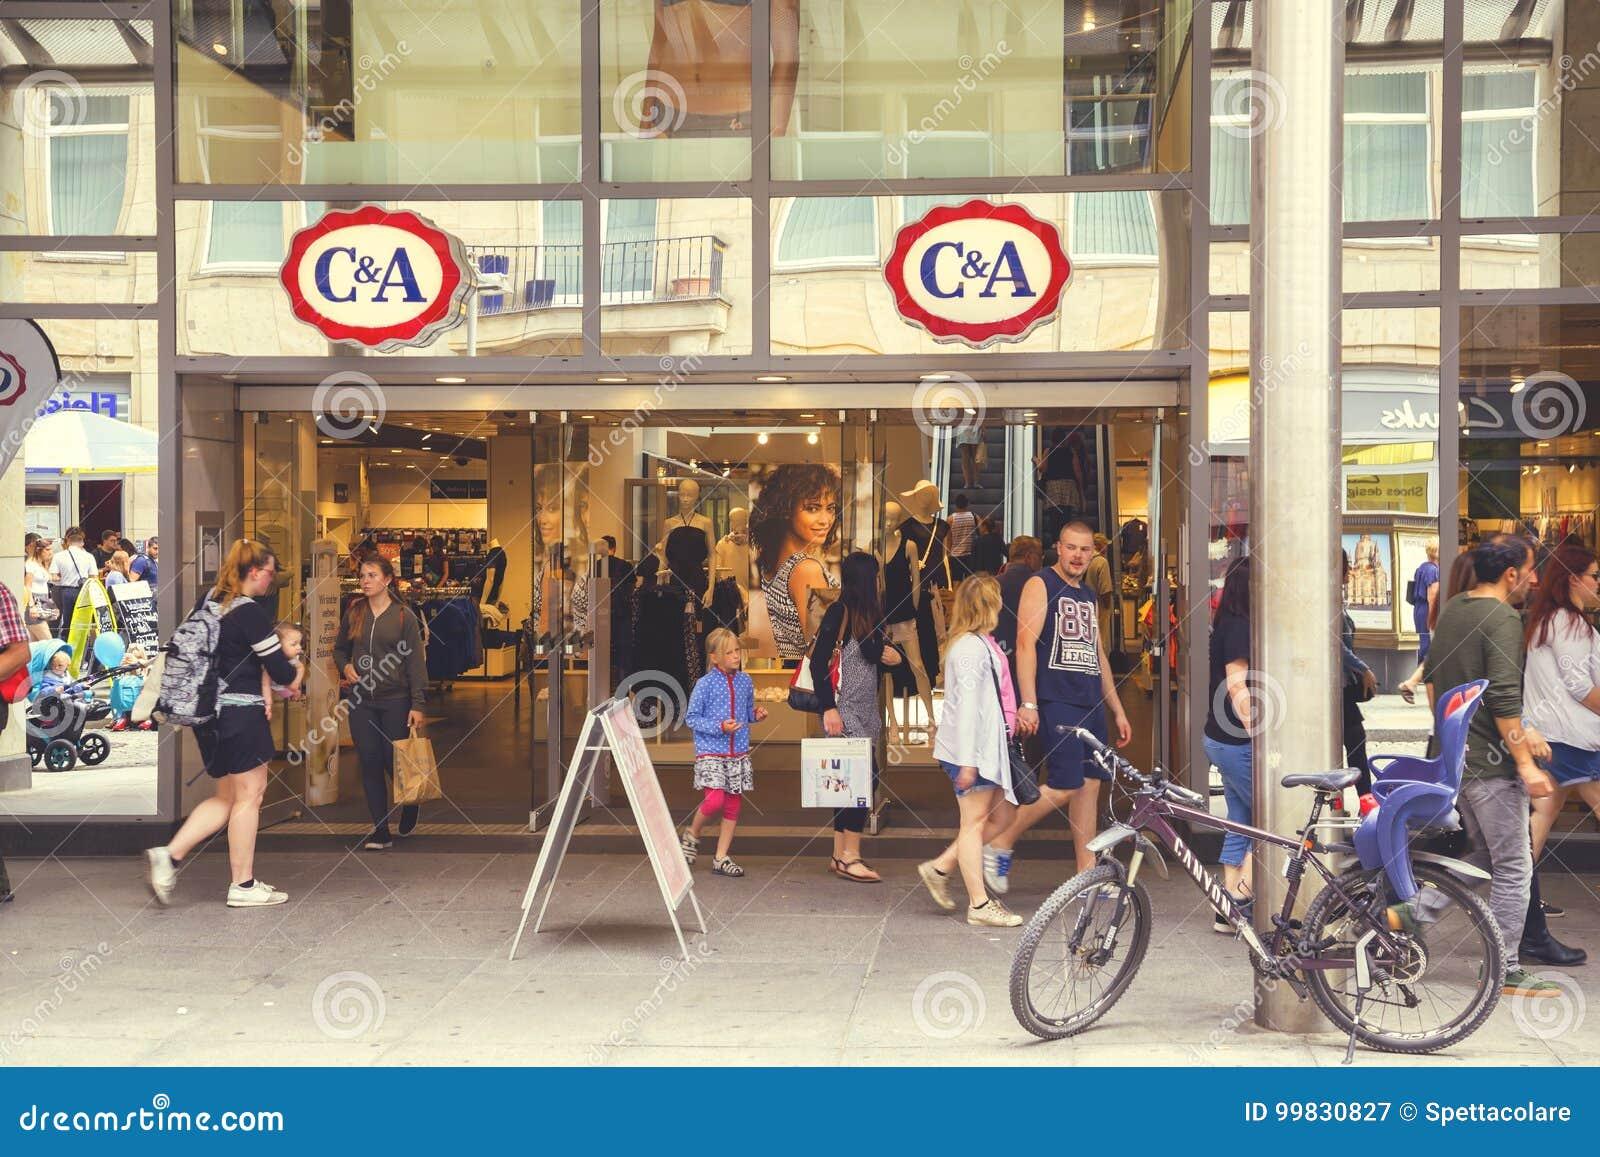 Ca Store Exterior Editorial Photography Image Of Elegant 99830827